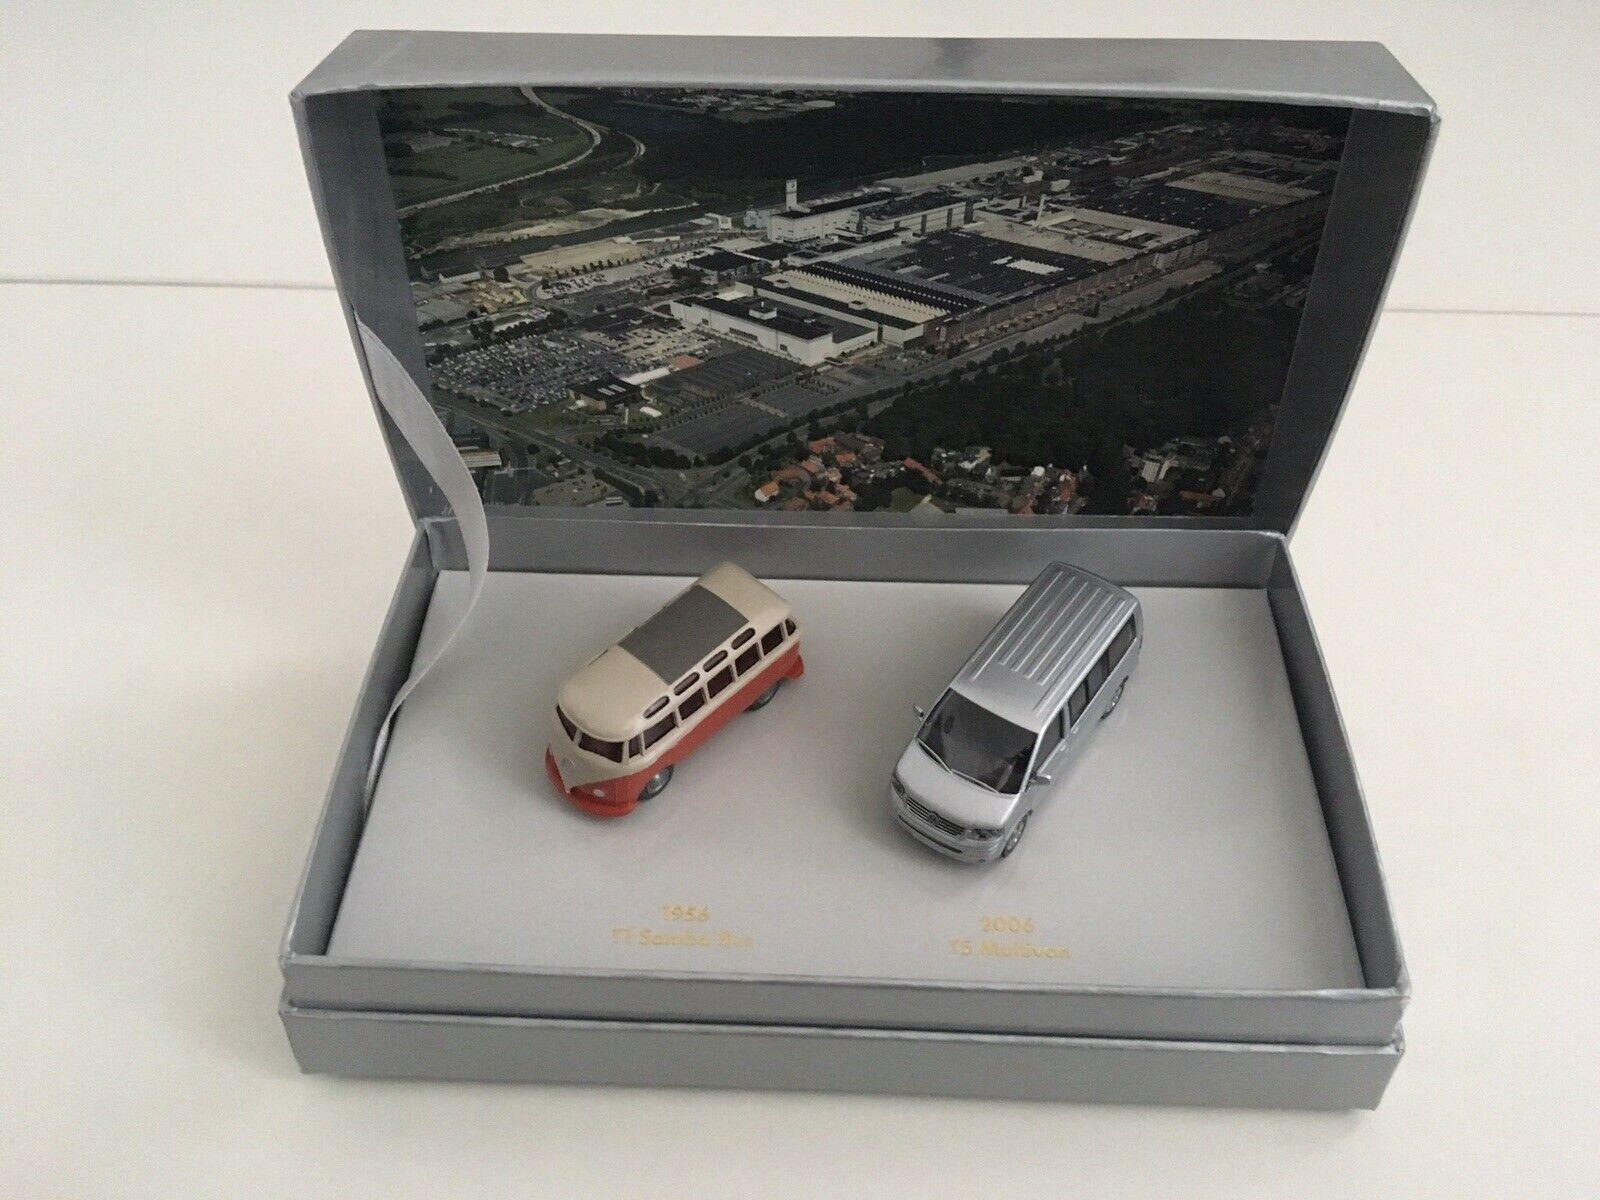 VW Pack  T1 Samba + T5 Multivan (50th Anniversary) - 1 87 scale - Viking